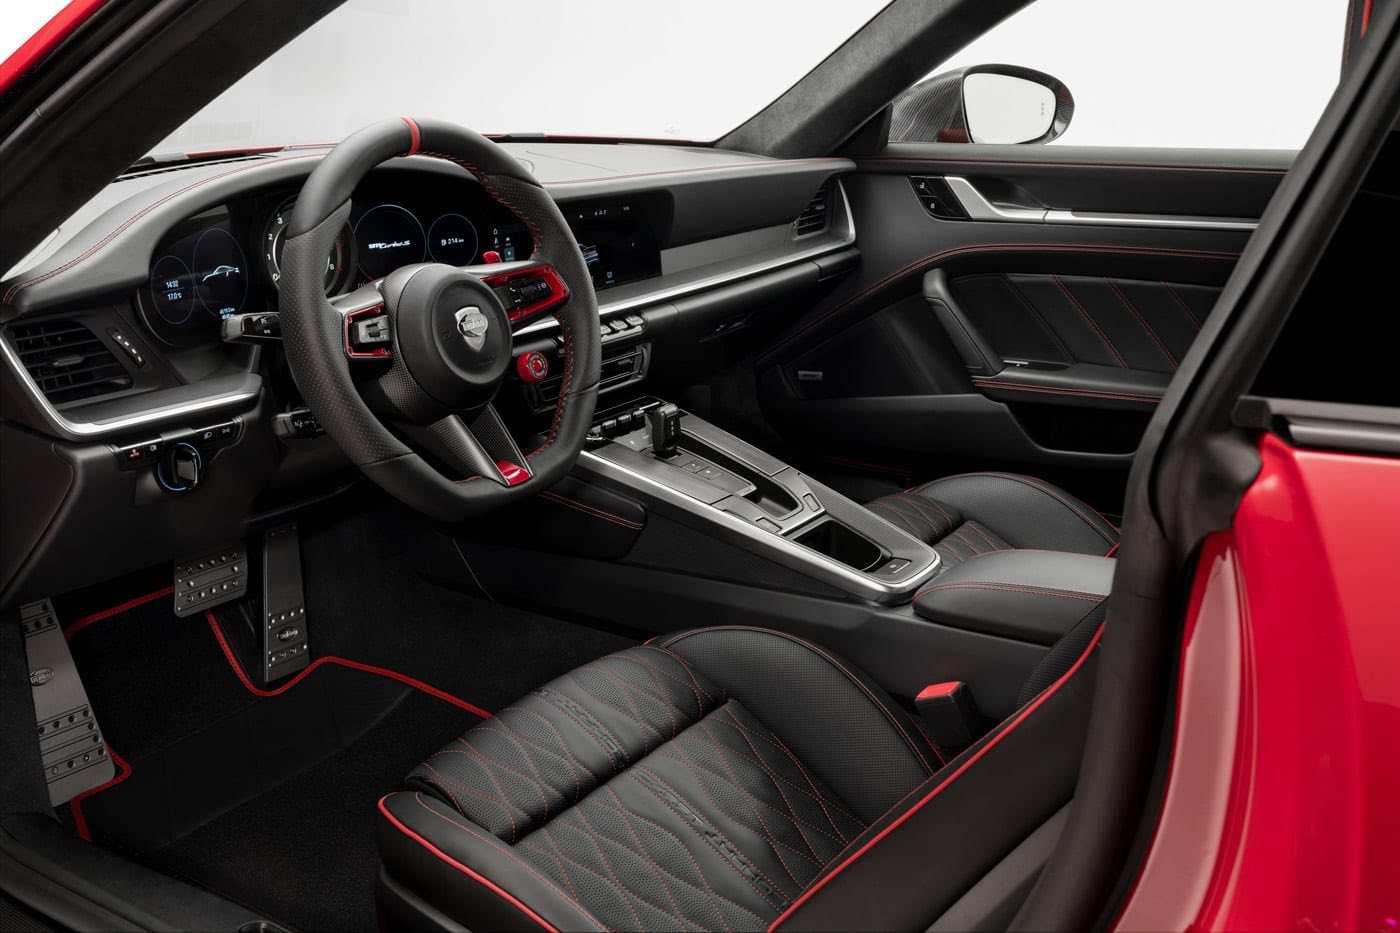 2021_Porsche_911_Turbo_S_by_TechArt_0007